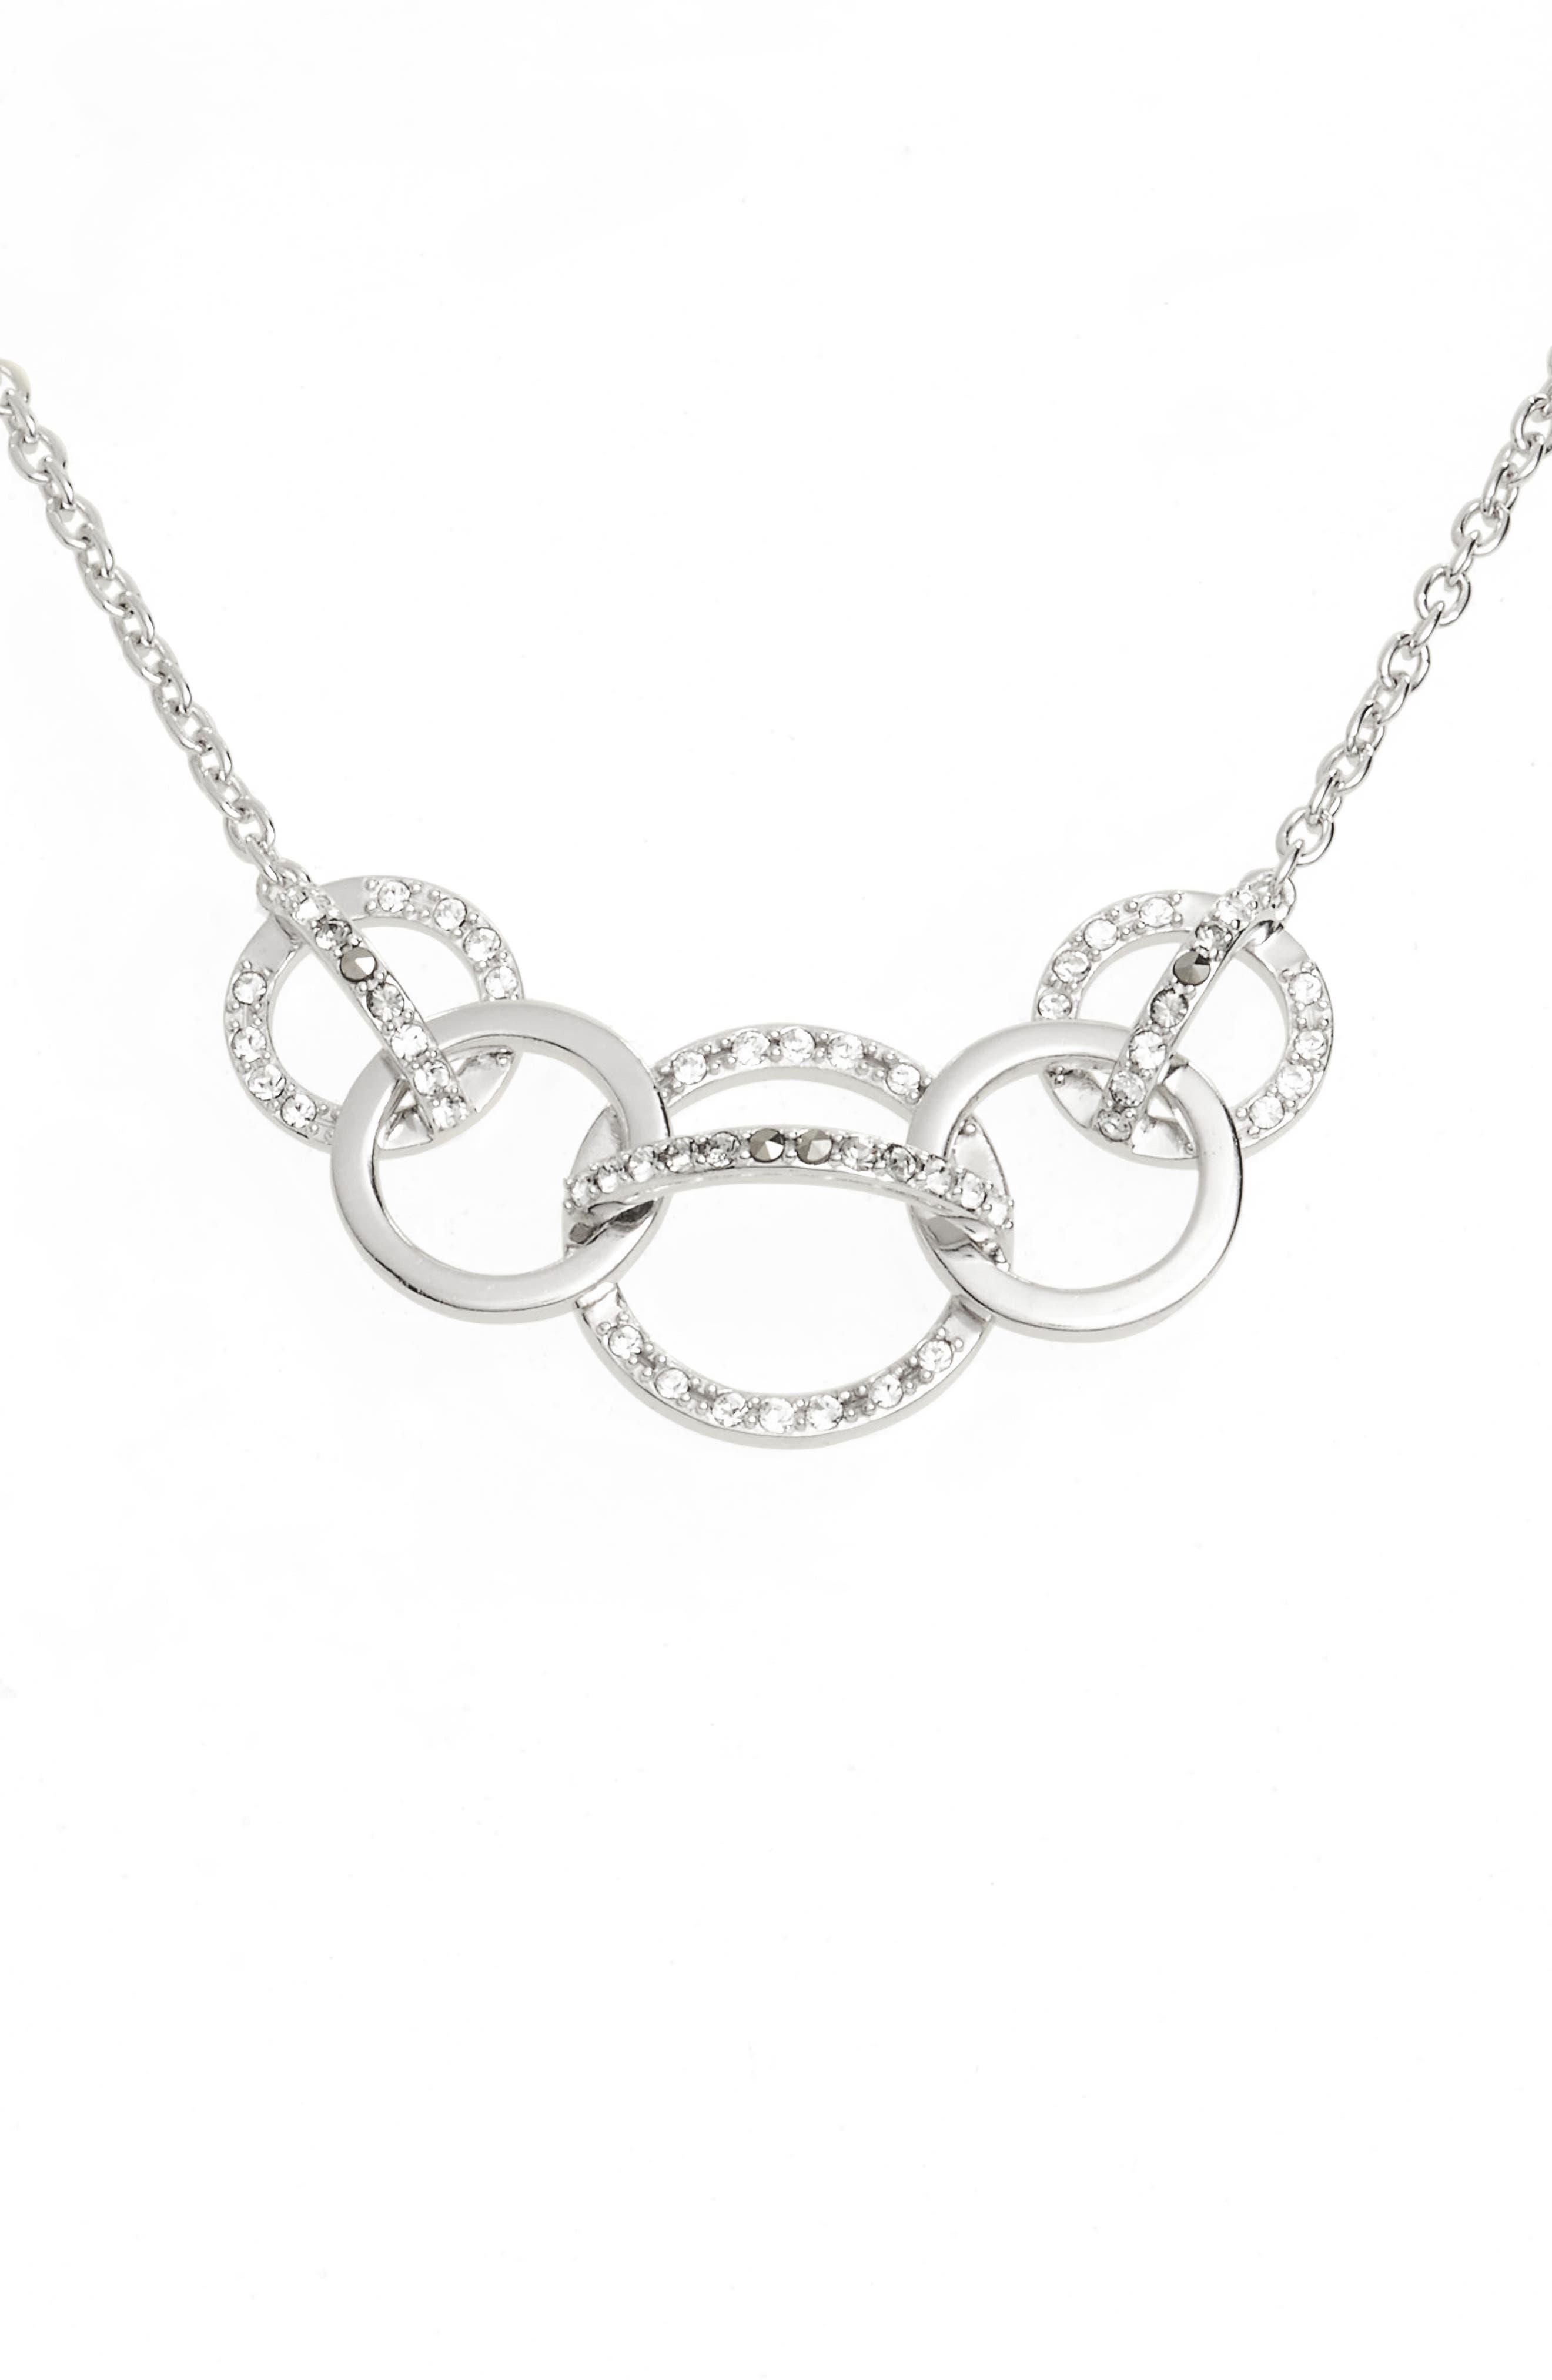 Alternate Image 1 Selected - Judith Jack Silver Sparkle Crystal Collar Necklace